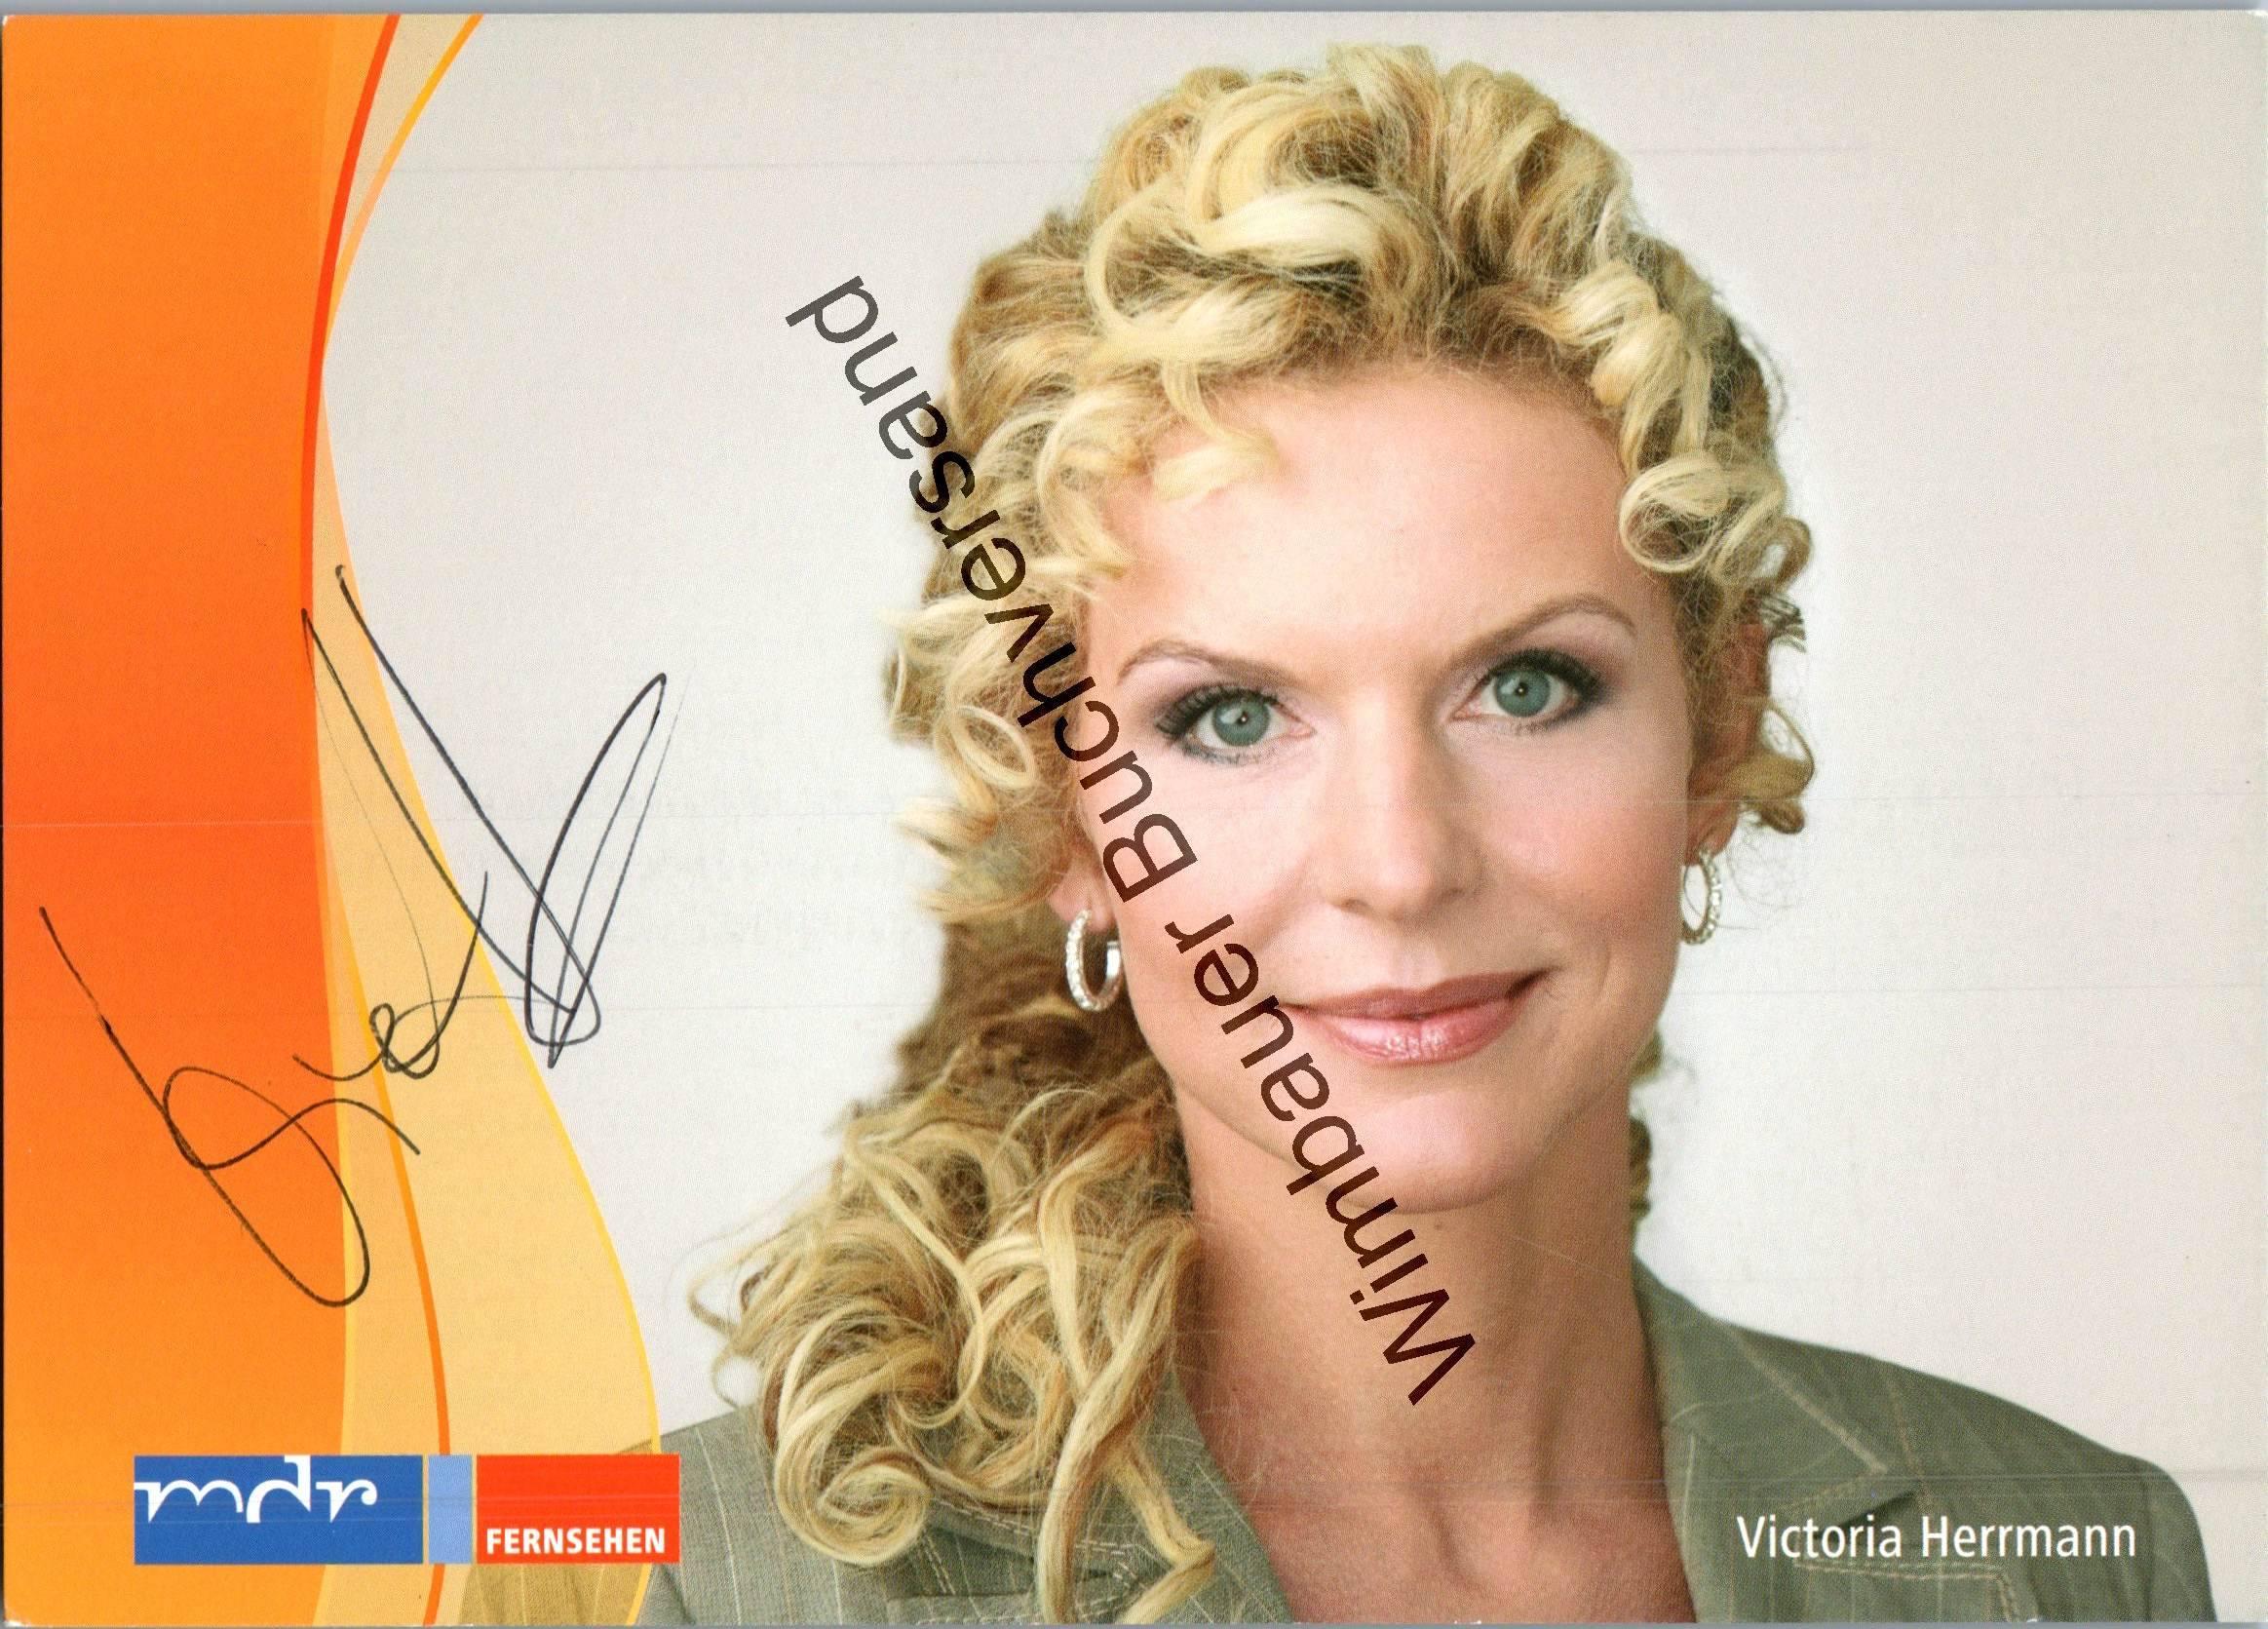 Originalautogramm Victoria Herrmann /// Autogramm Autograph signiert signed signee